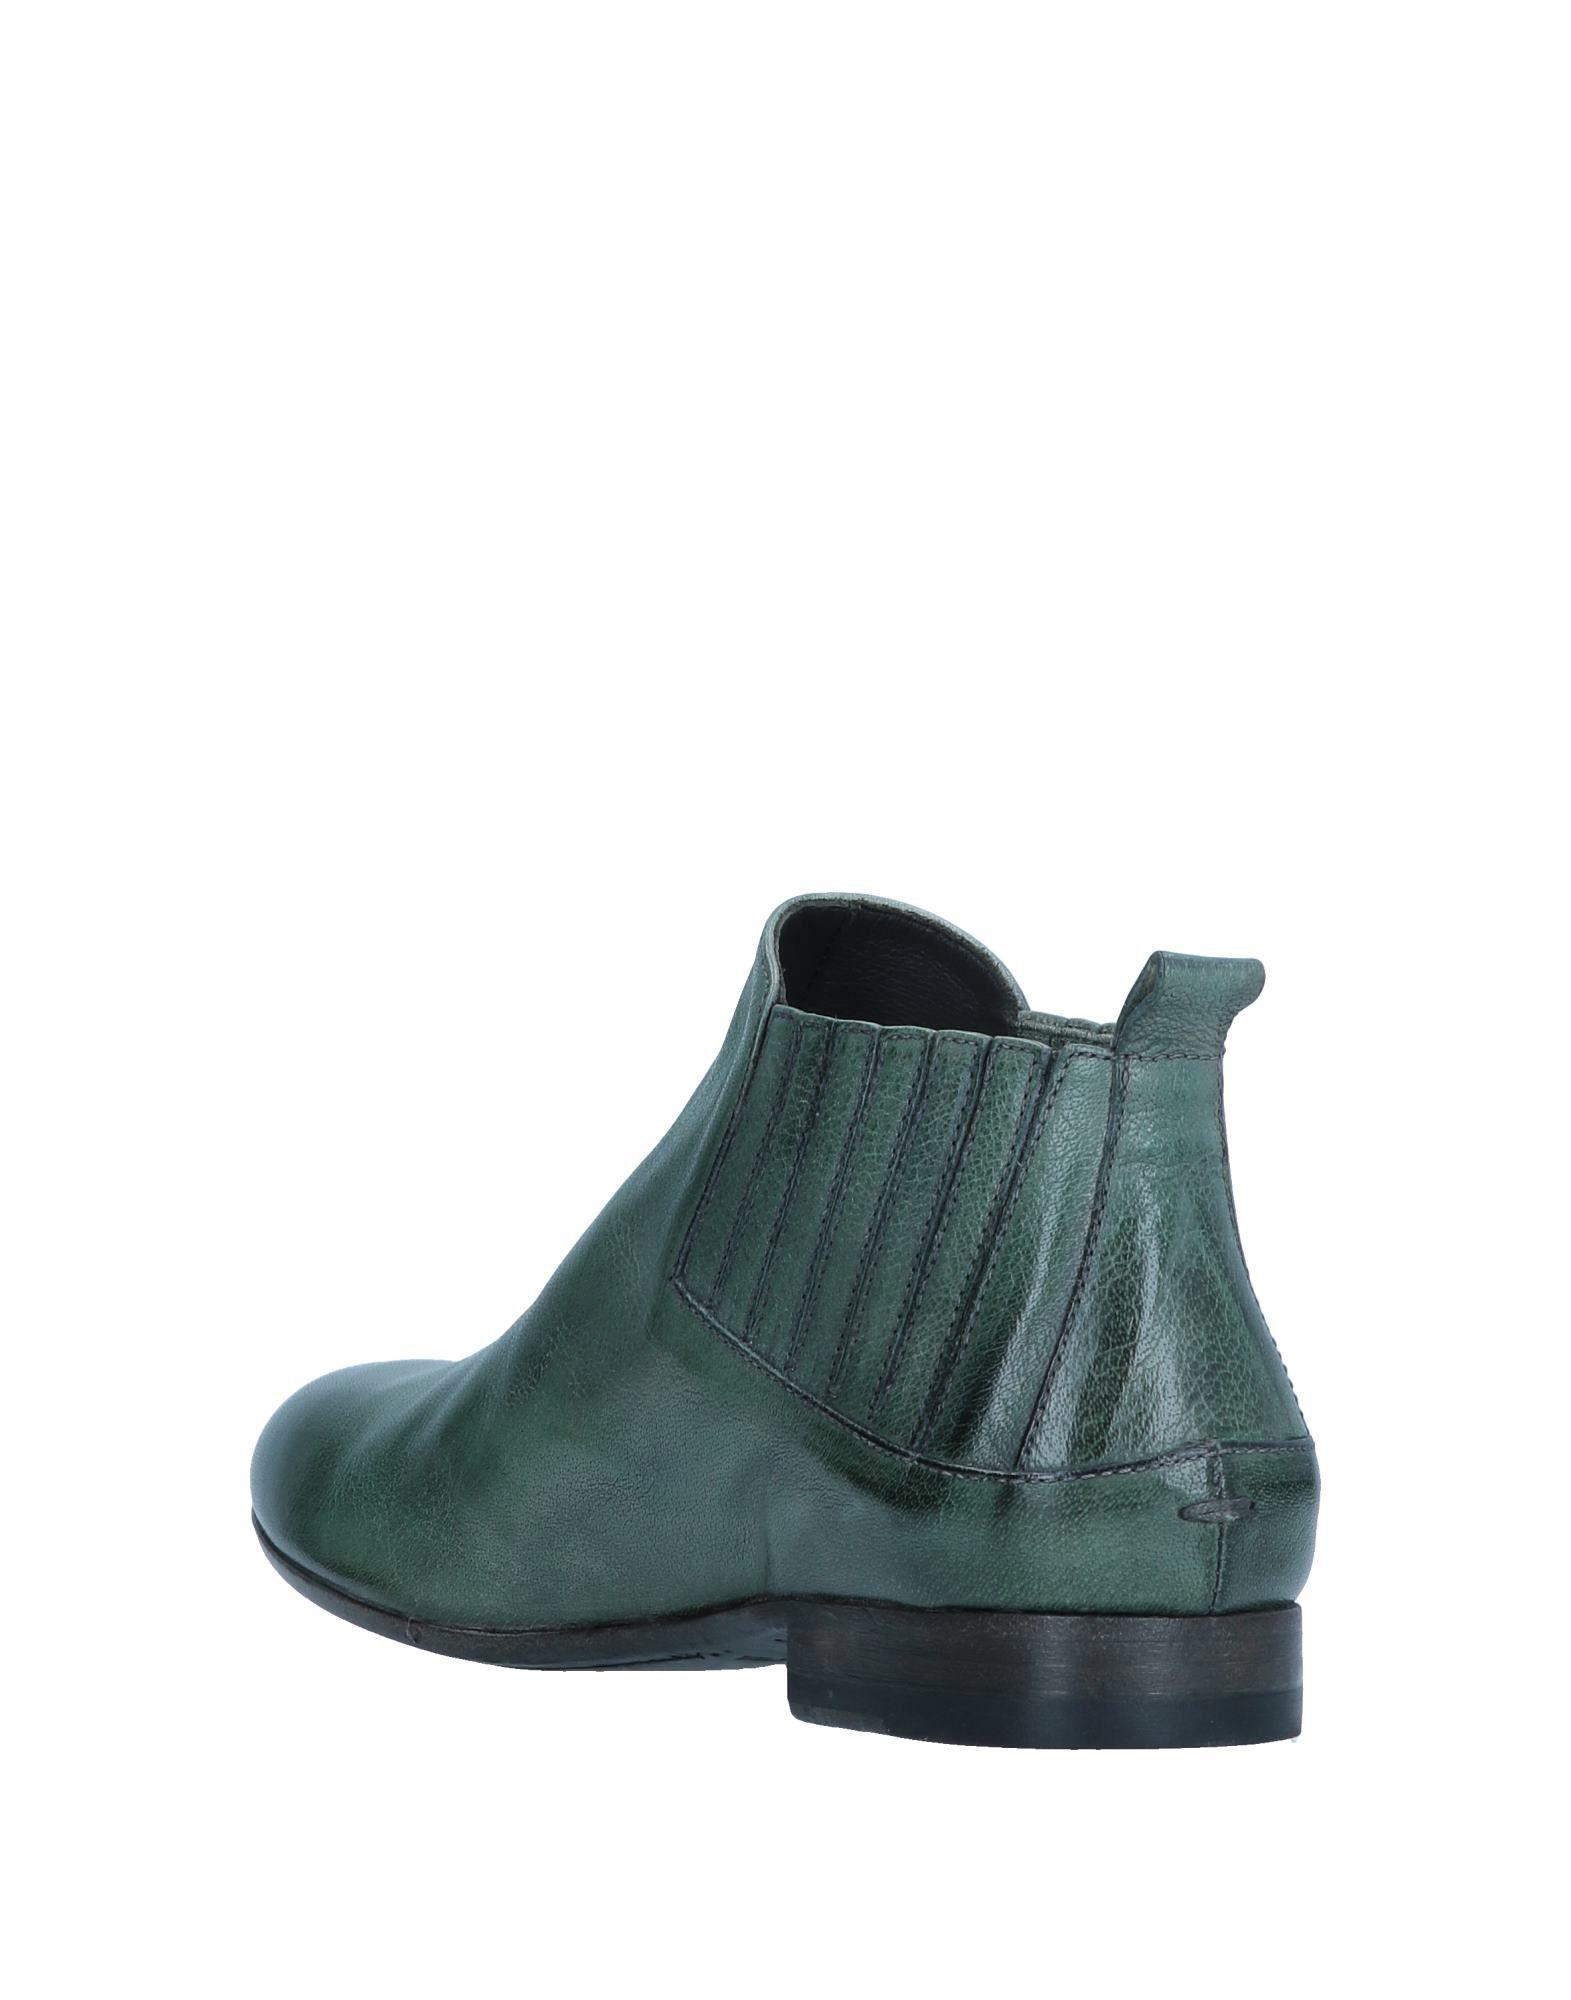 Pantanetti Stiefelette Damen  11525451TMGut Schuhe aussehende strapazierfähige Schuhe 11525451TMGut 9646c1